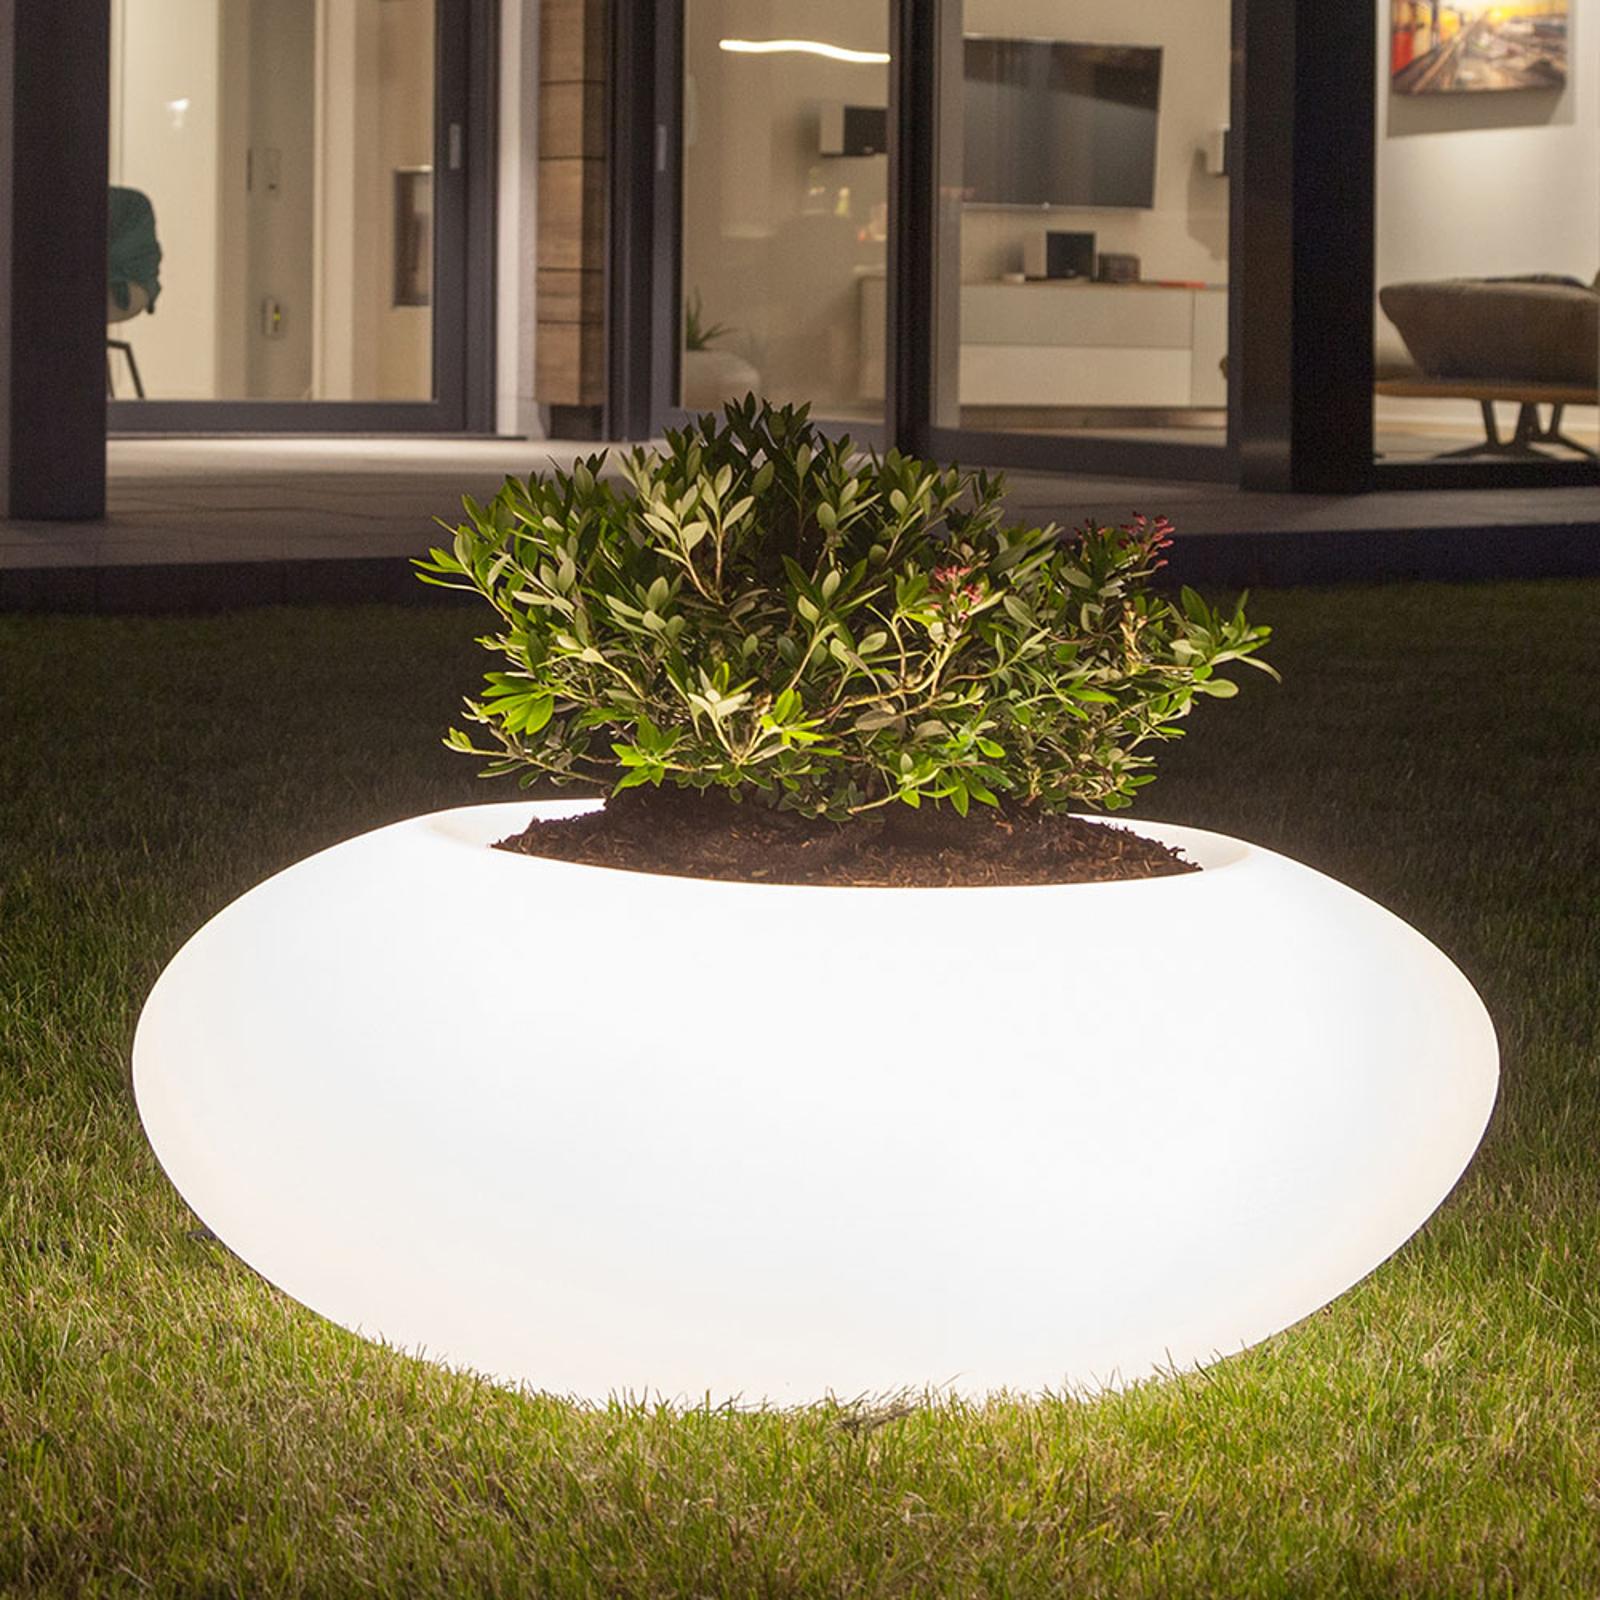 Dekorativní lampa Storus VI LED RGBW, bílá